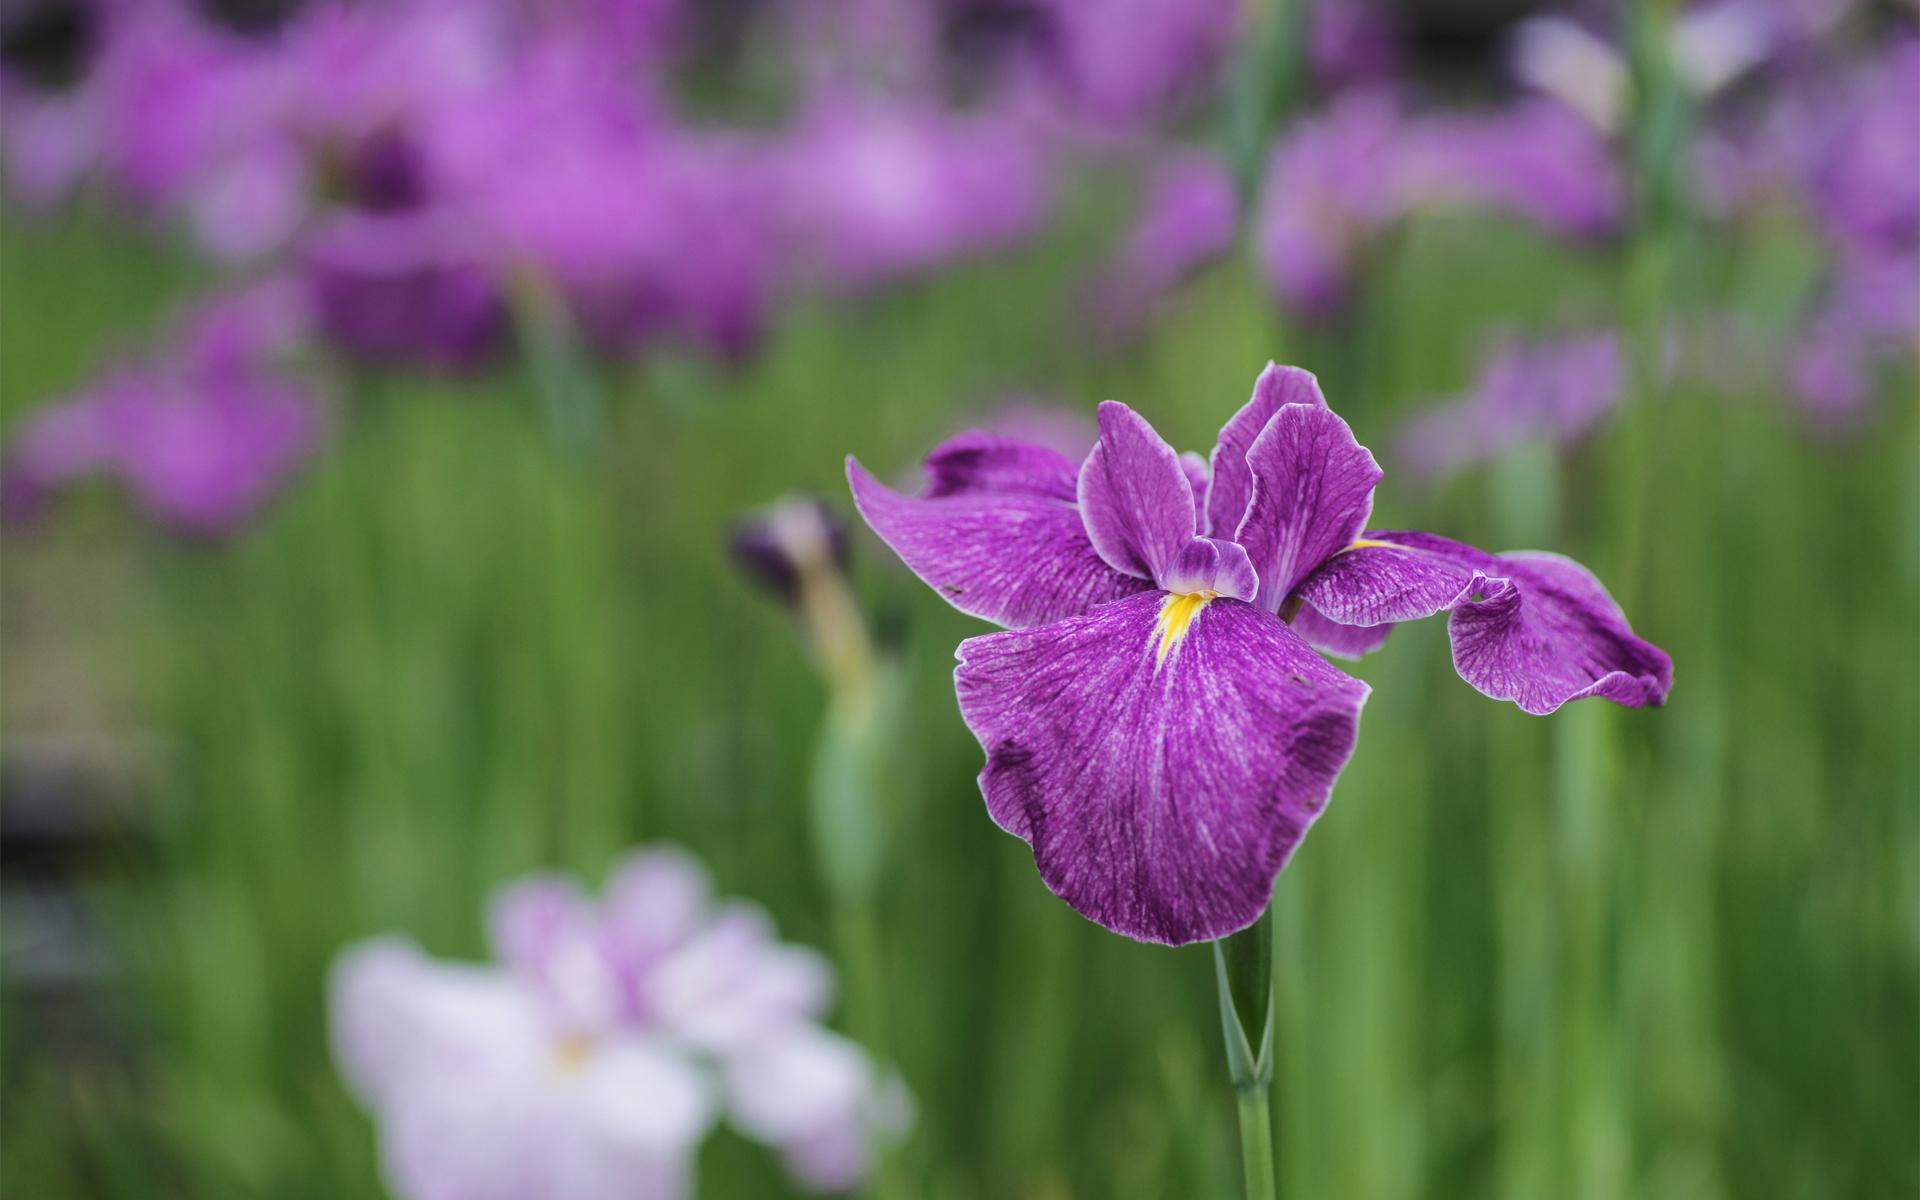 шмель,ирис,цветок,лето  № 529631 бесплатно